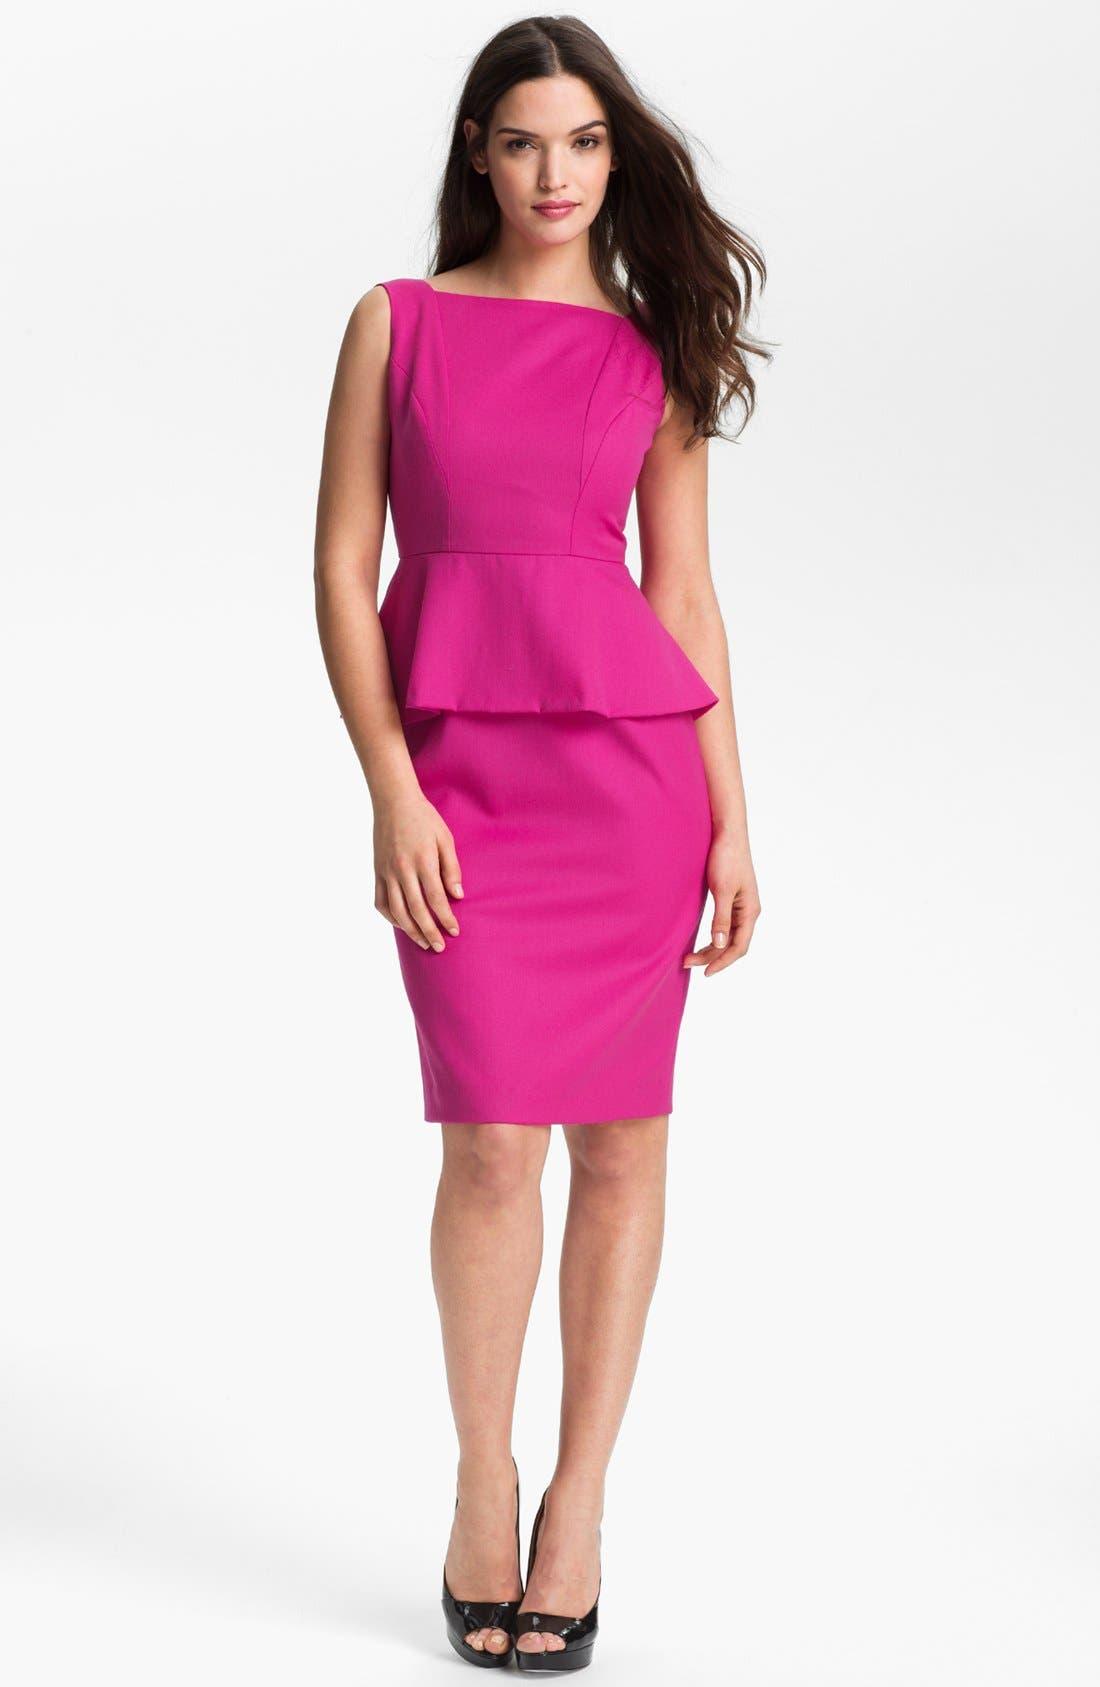 Alternate Image 1 Selected - Anne Klein Peplum Sheath Dress (Petite)